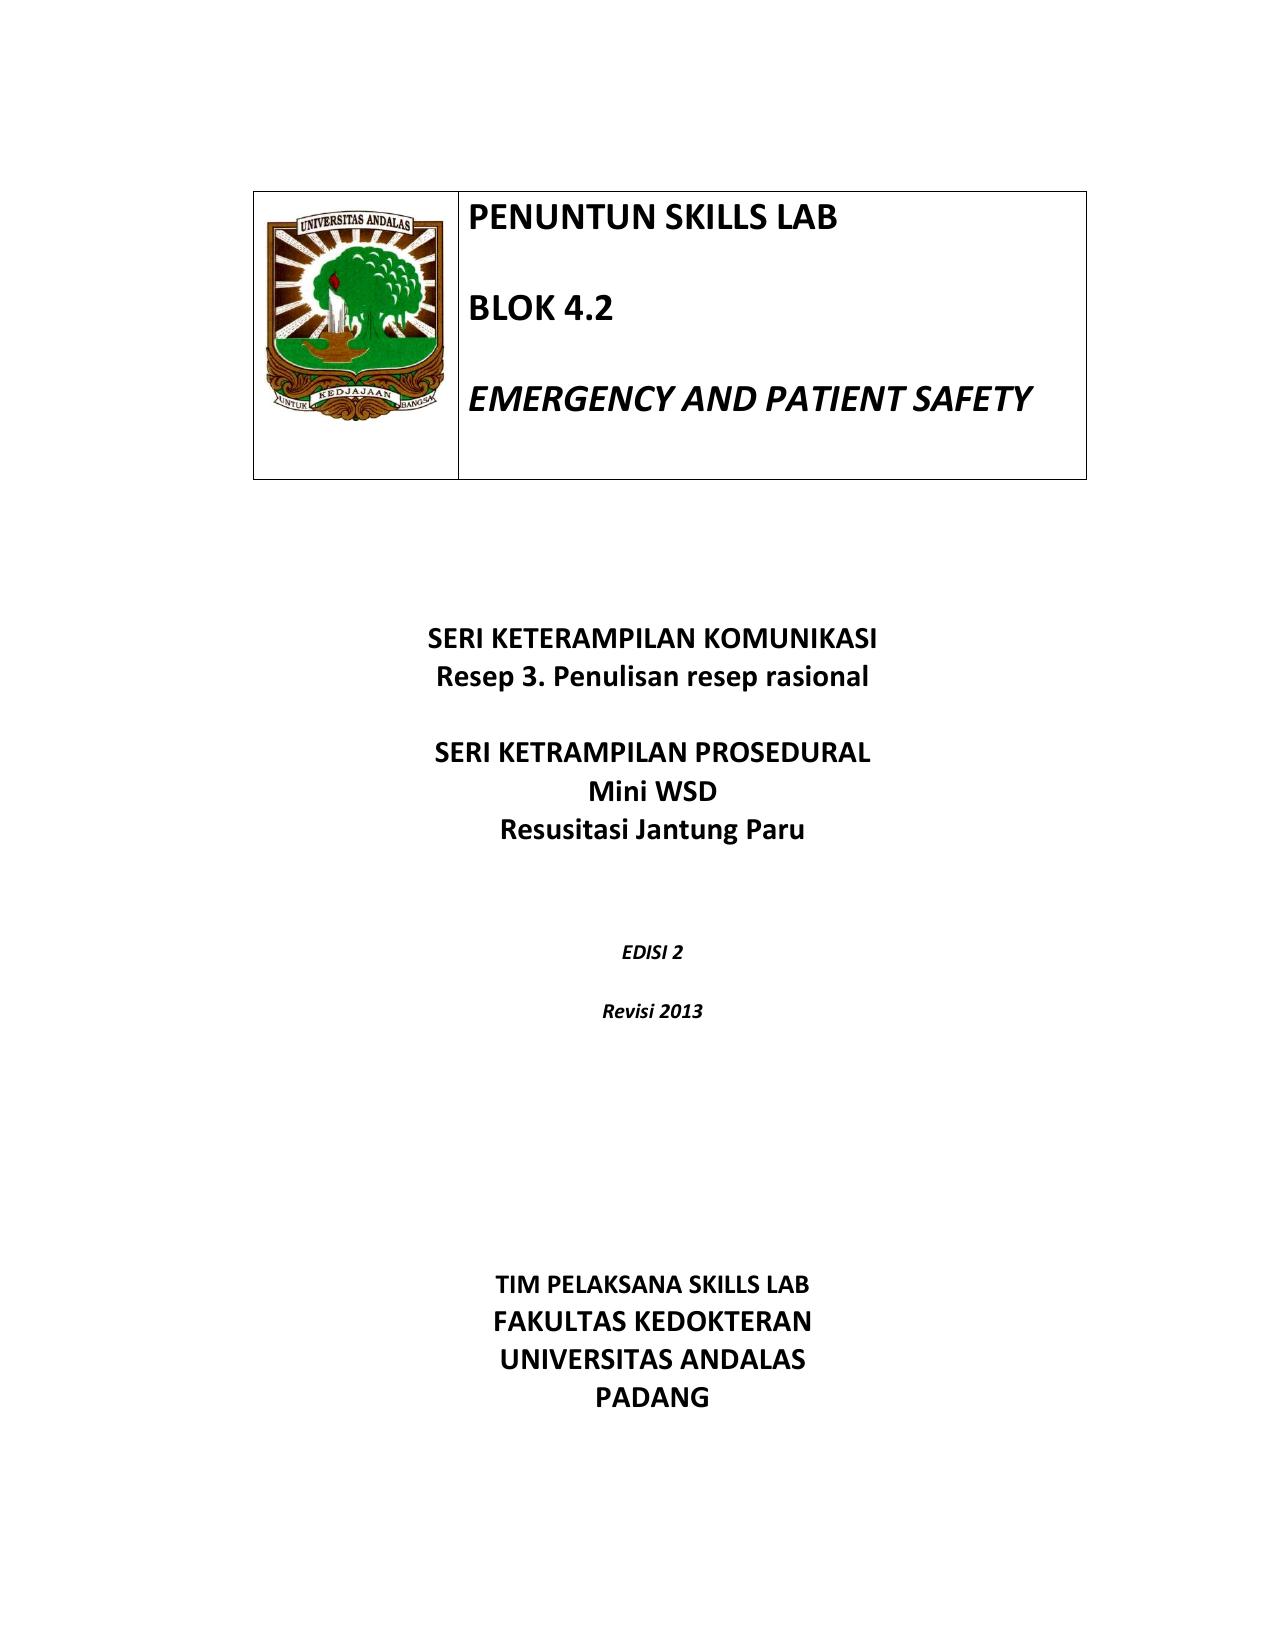 Penuntun Skills Lab Blok 4 2 Emergency And